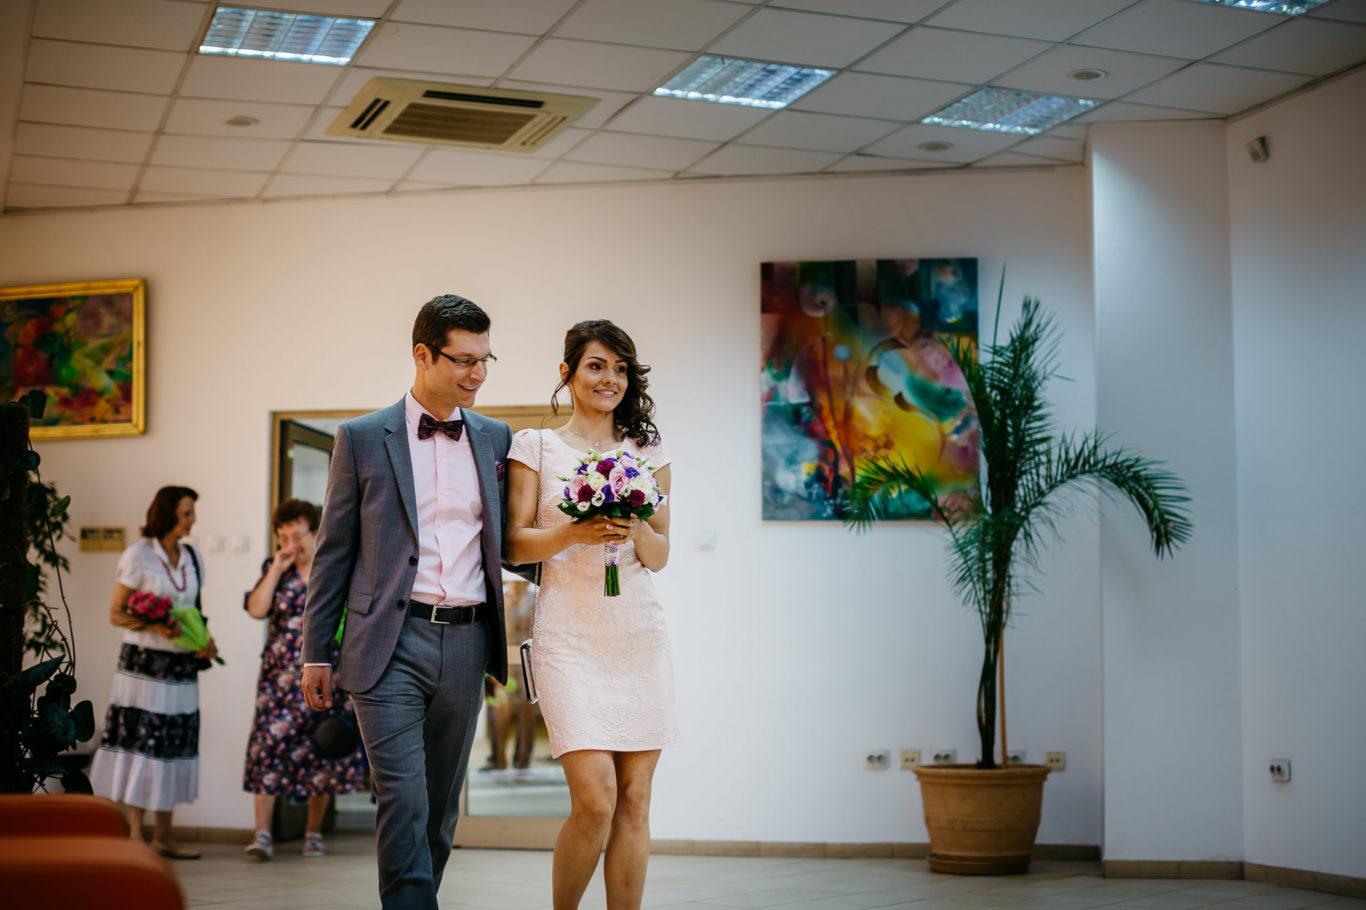 0038-fotografie-nunta-bucuresti-dana-radu-fotograf-ciprian-dumitrescu-cd2_6141